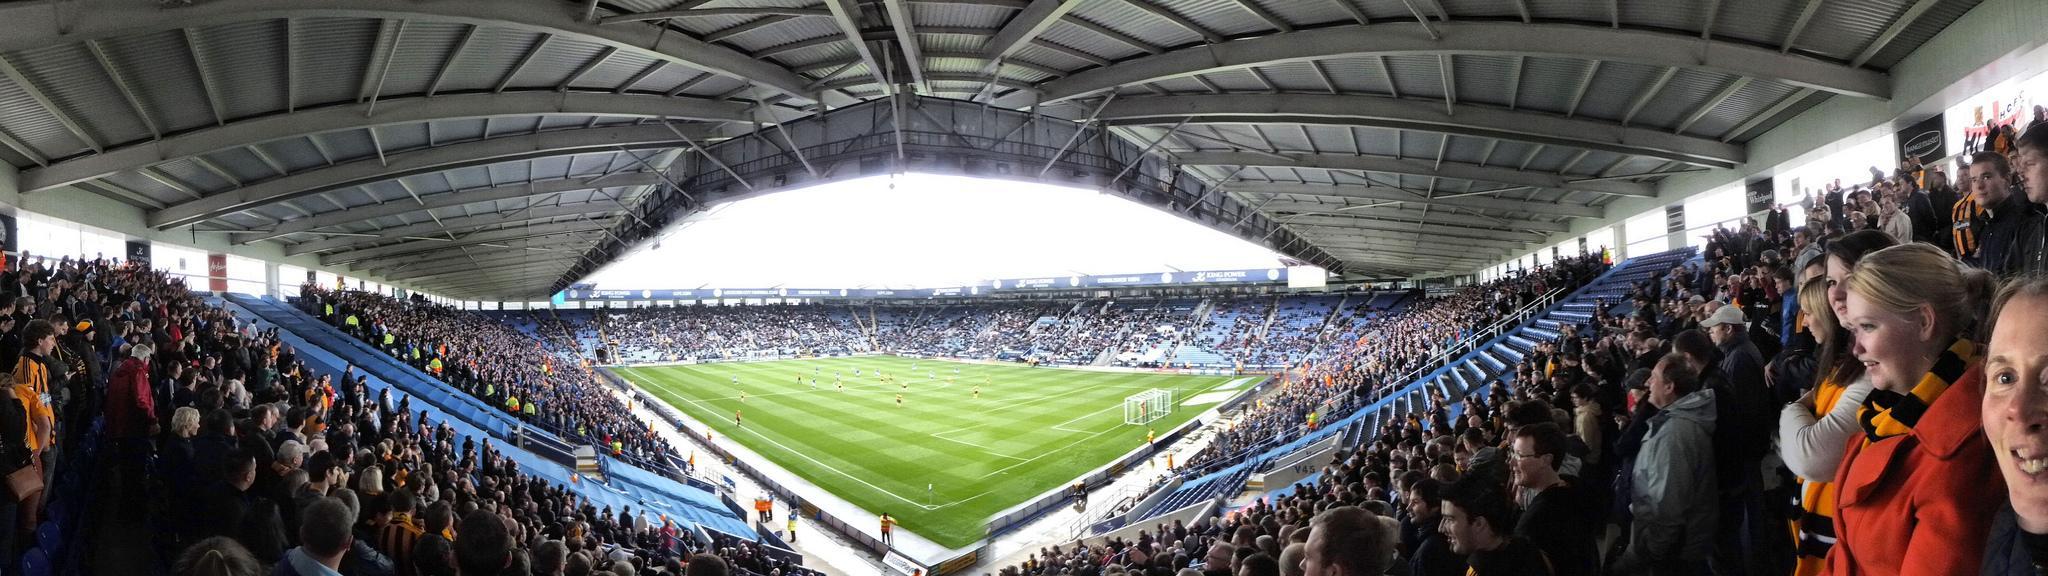 King Power Stadium (Filbert Way) – StadiumDB.com